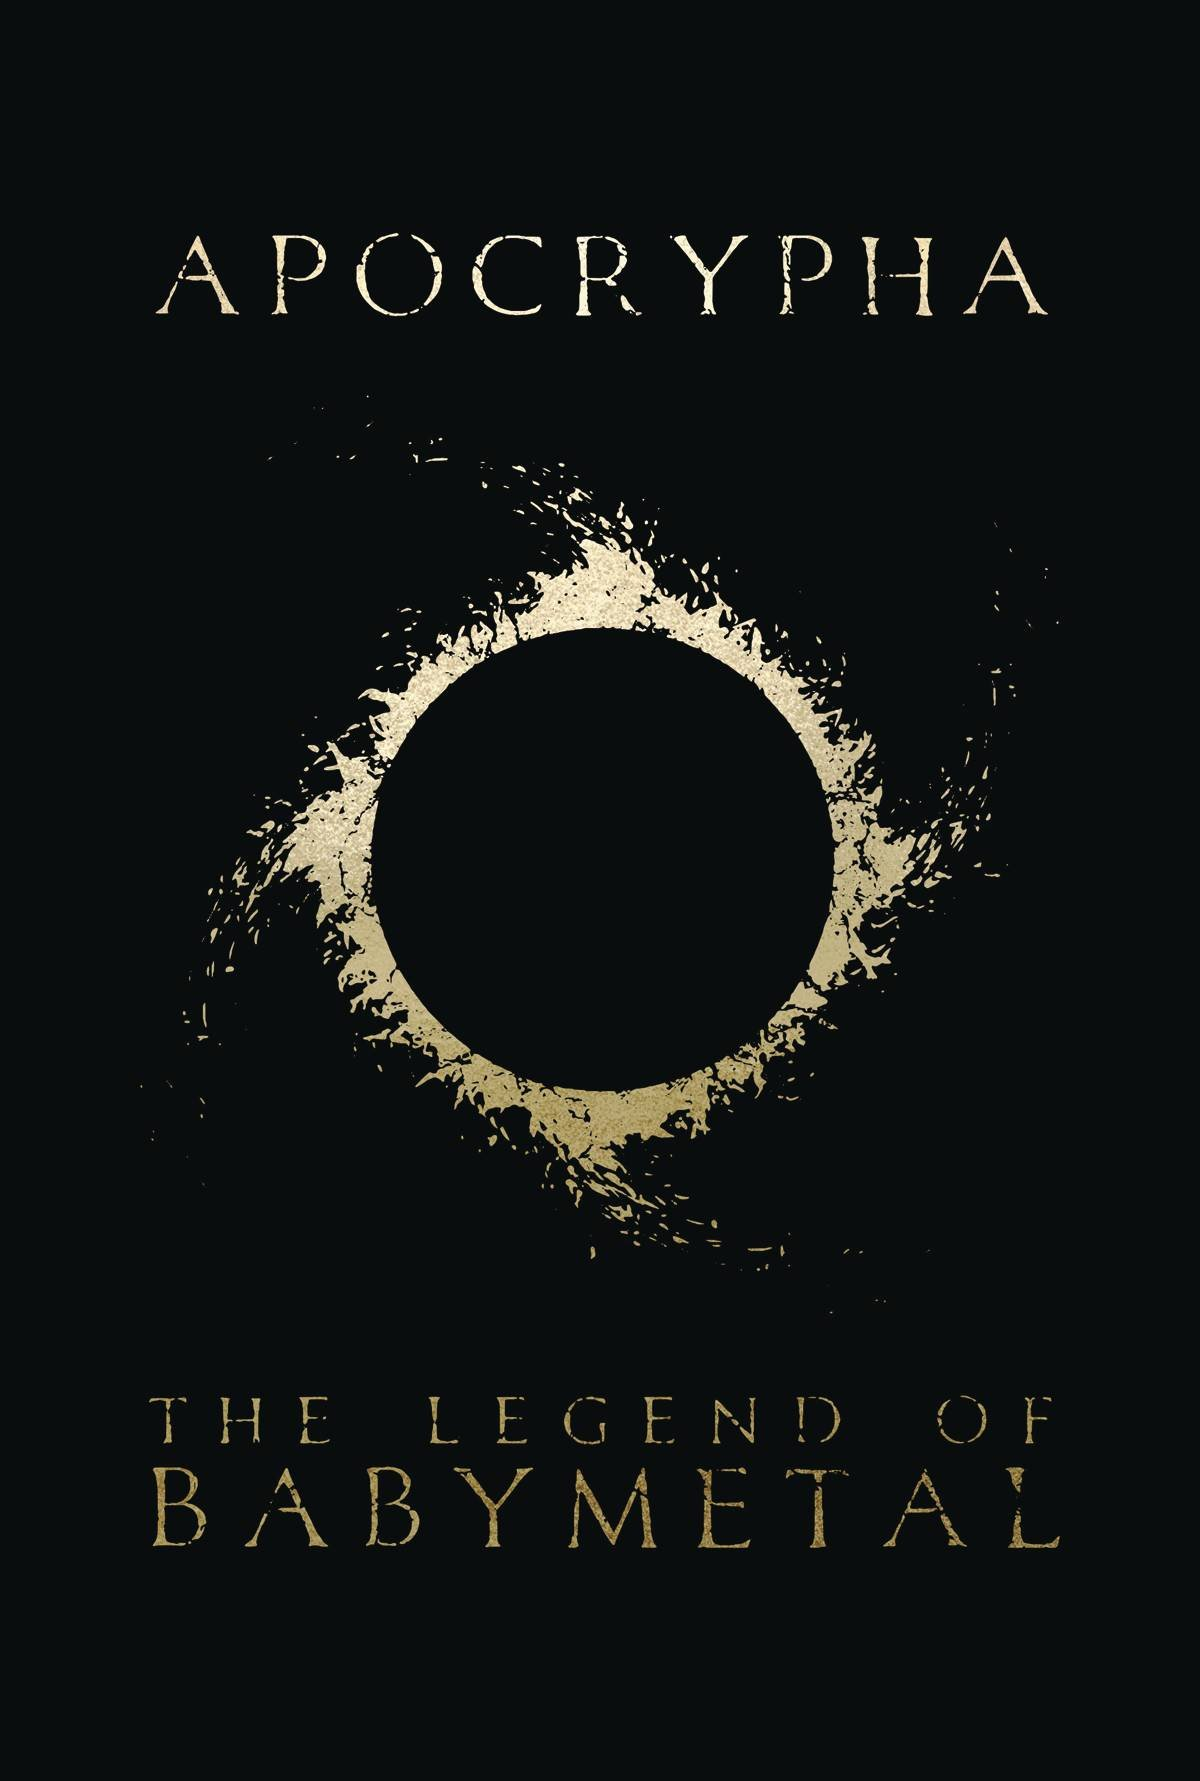 JRock247-BABYMETAL-Apocrypha-Graphic-Novel-review-1